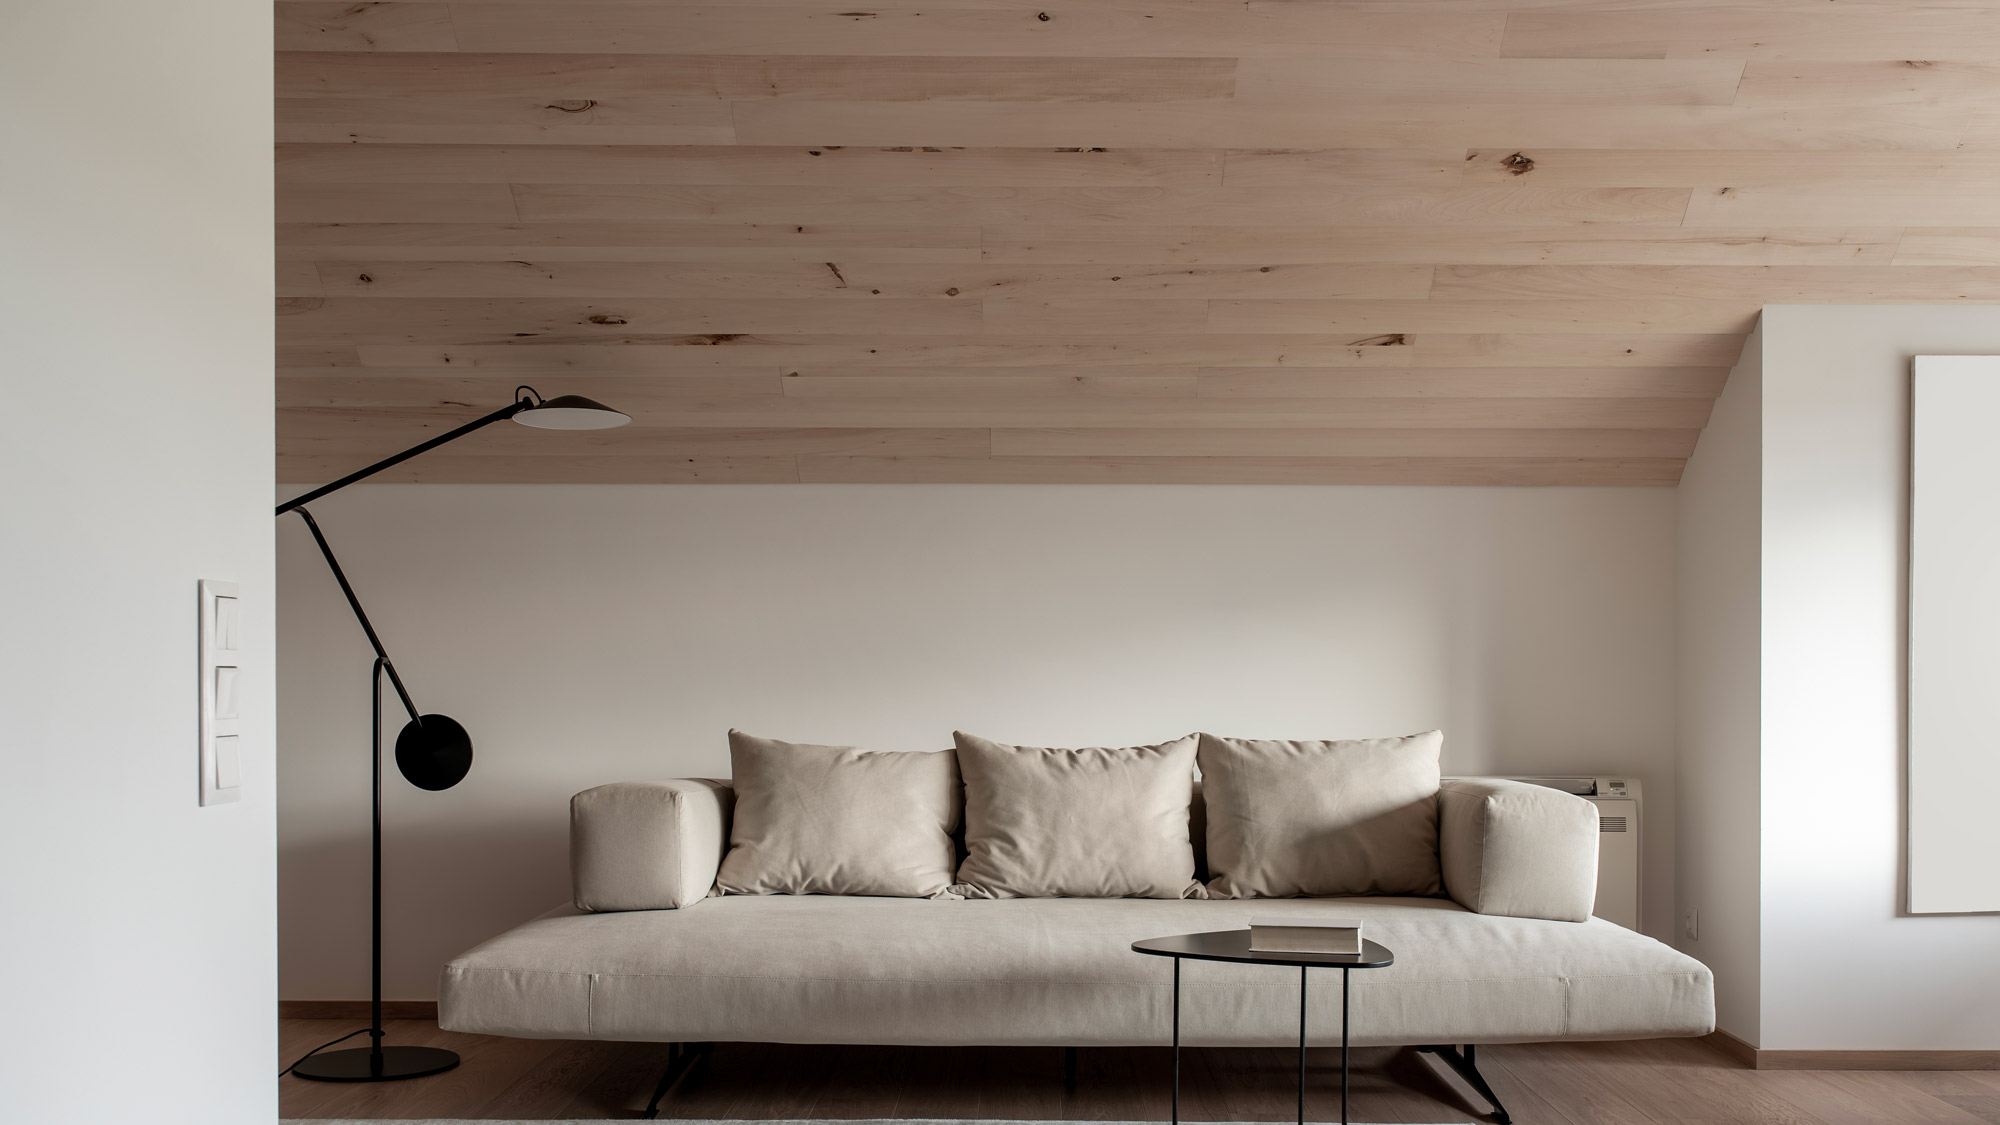 Posa Parquet Flottante Fai Da Te parquet a soffitto | montaggio fai da te - bricoportale: fai